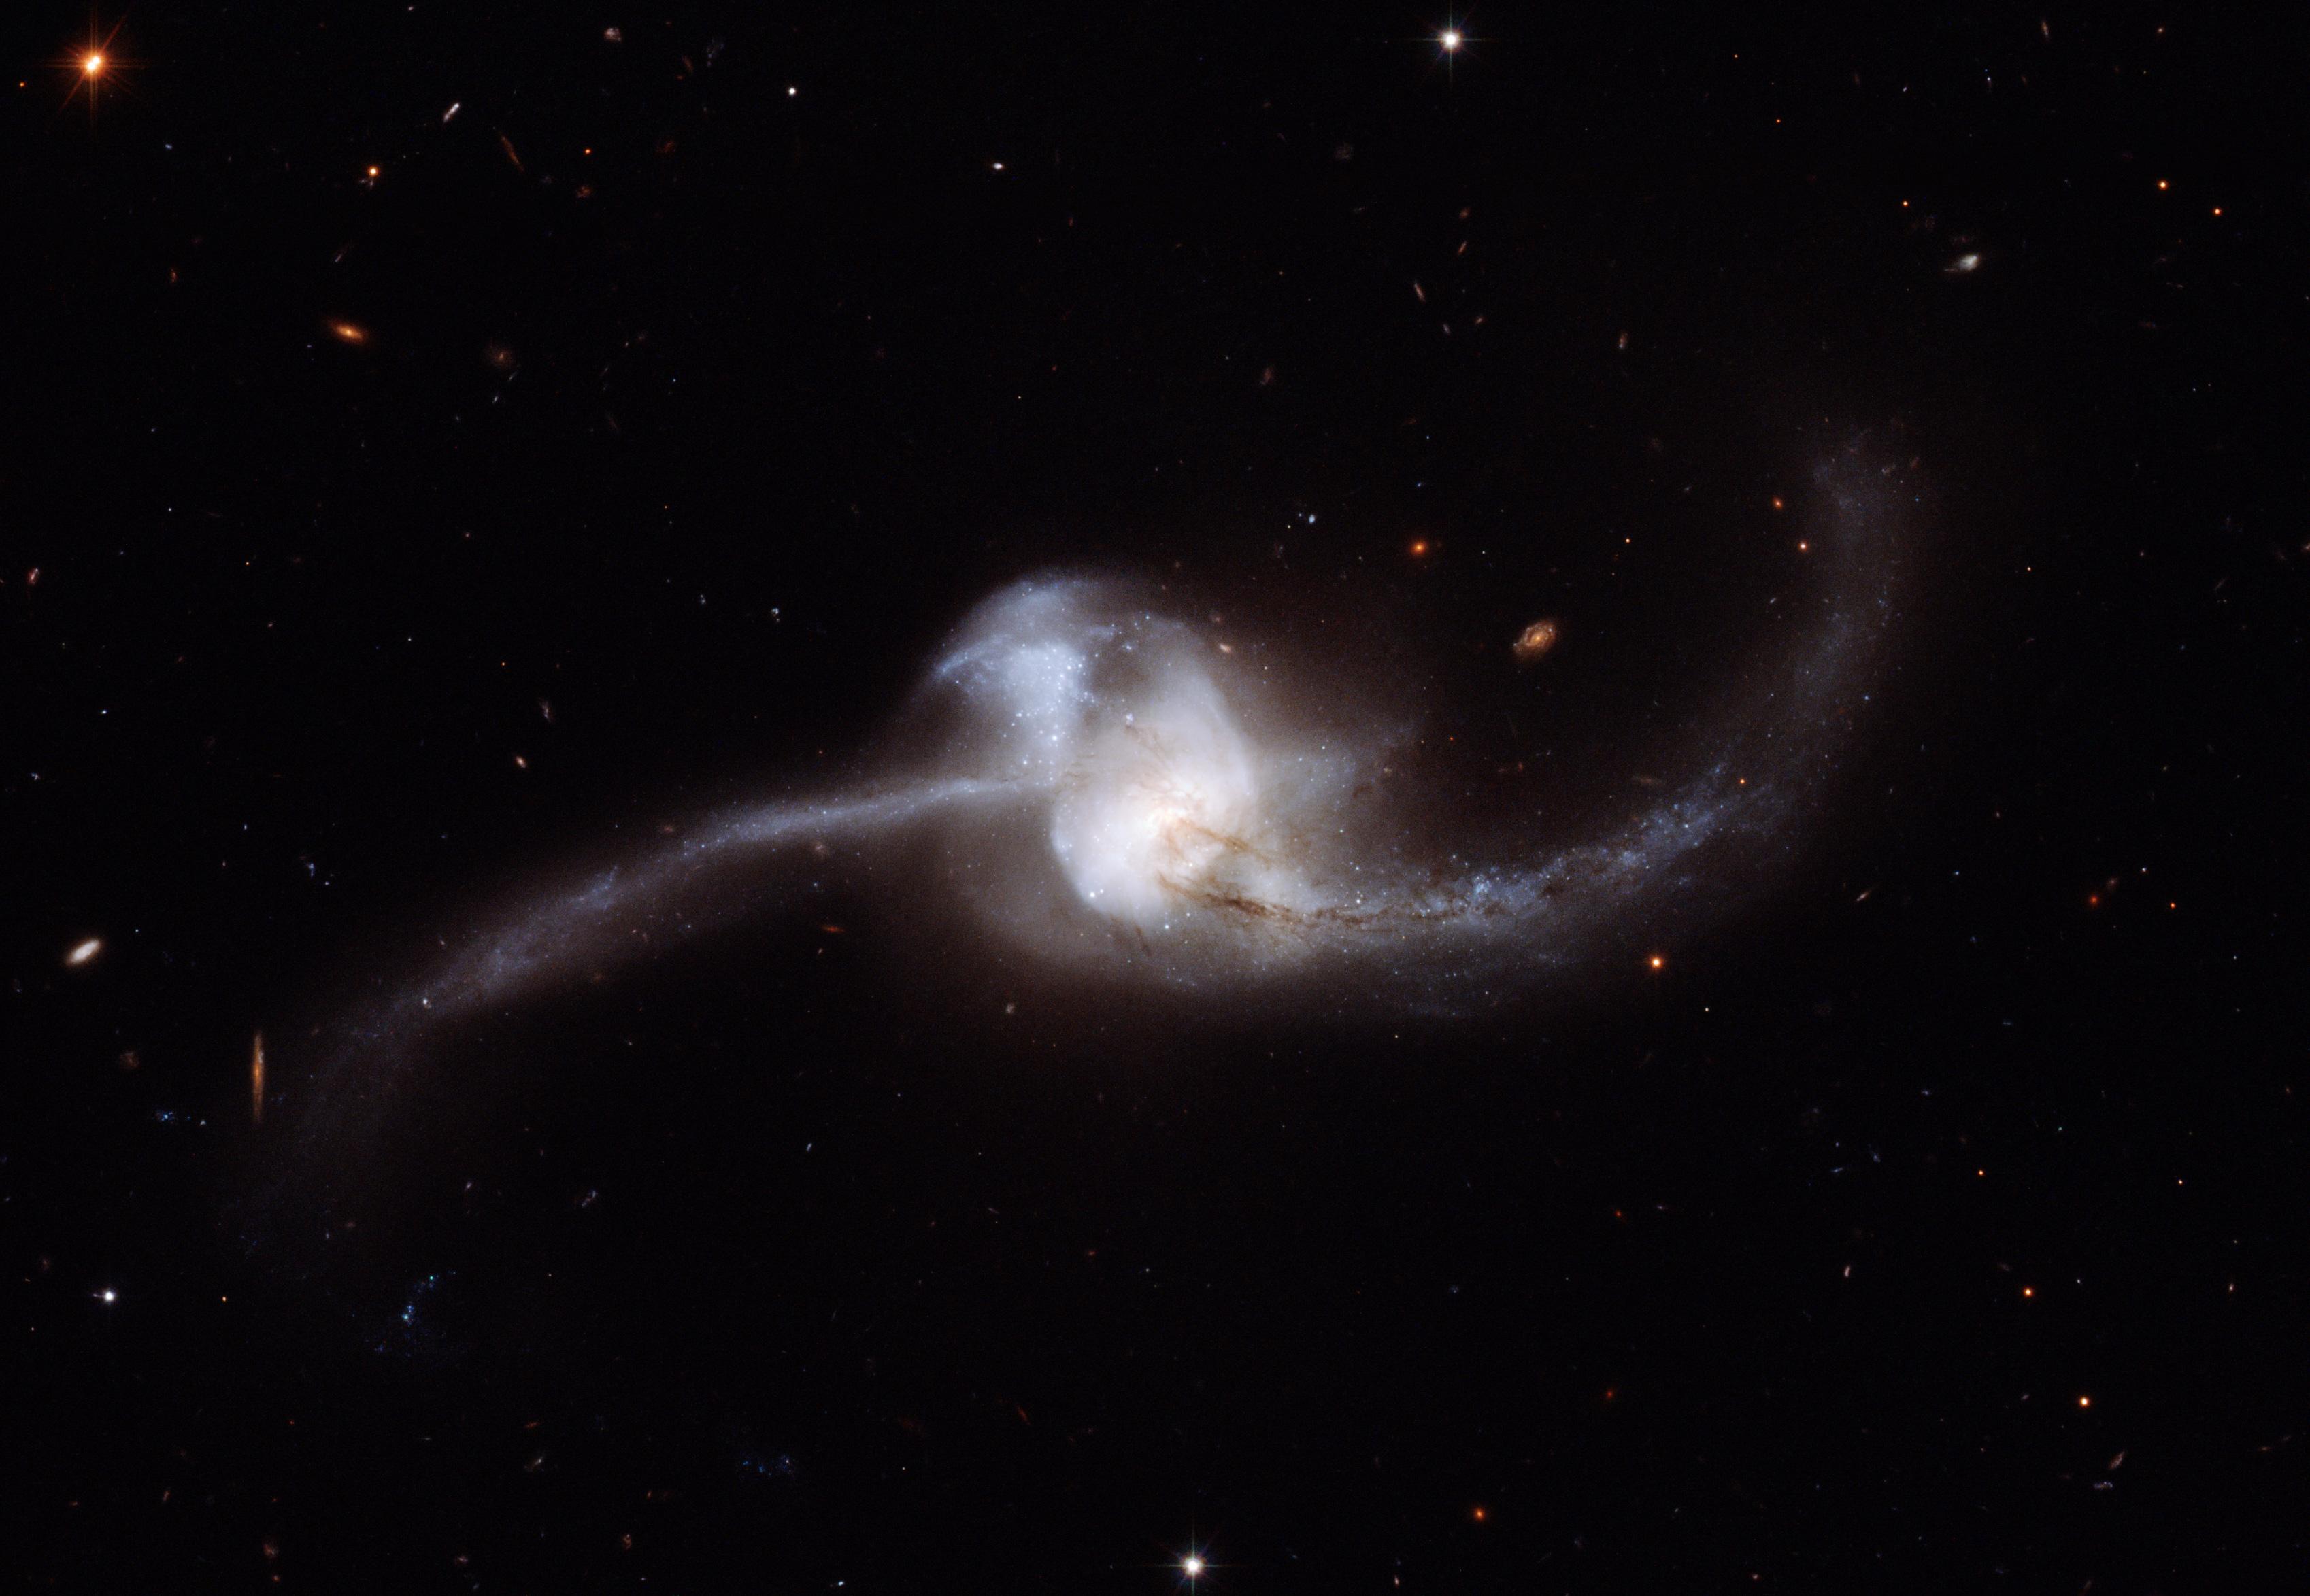 File:NGC 2623 Hubble heic0912a.jpg